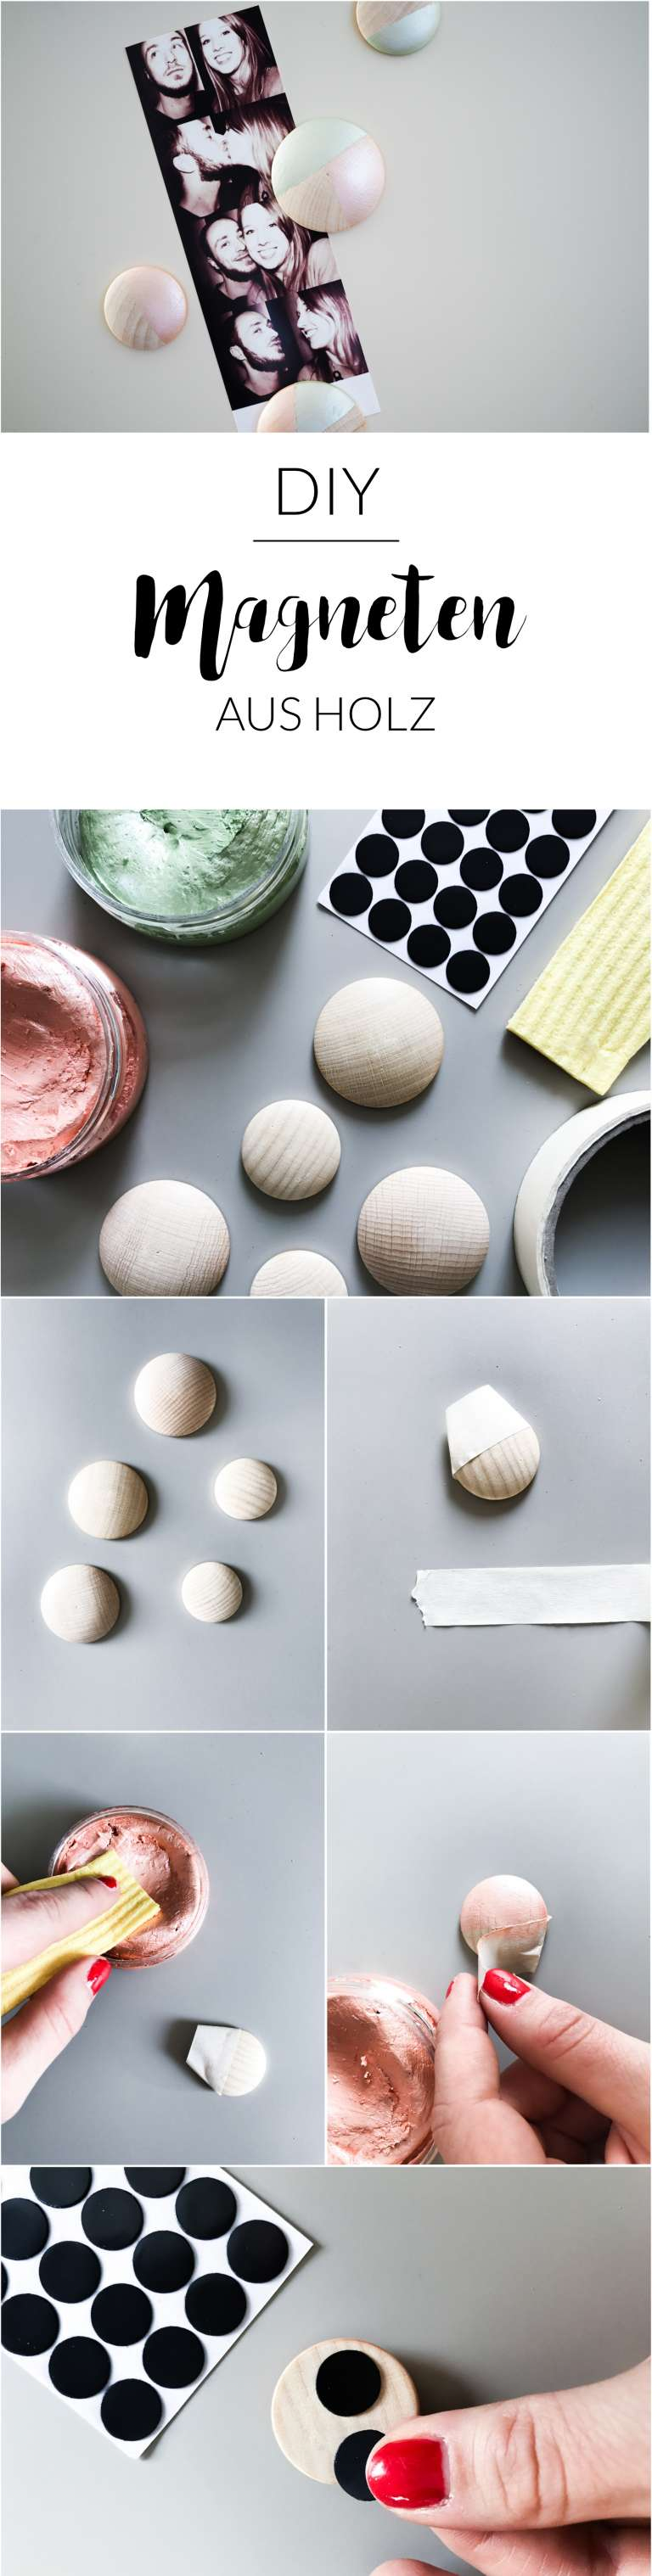 How To Diy Magneten Aus Holz Selber Machen Paulsvera